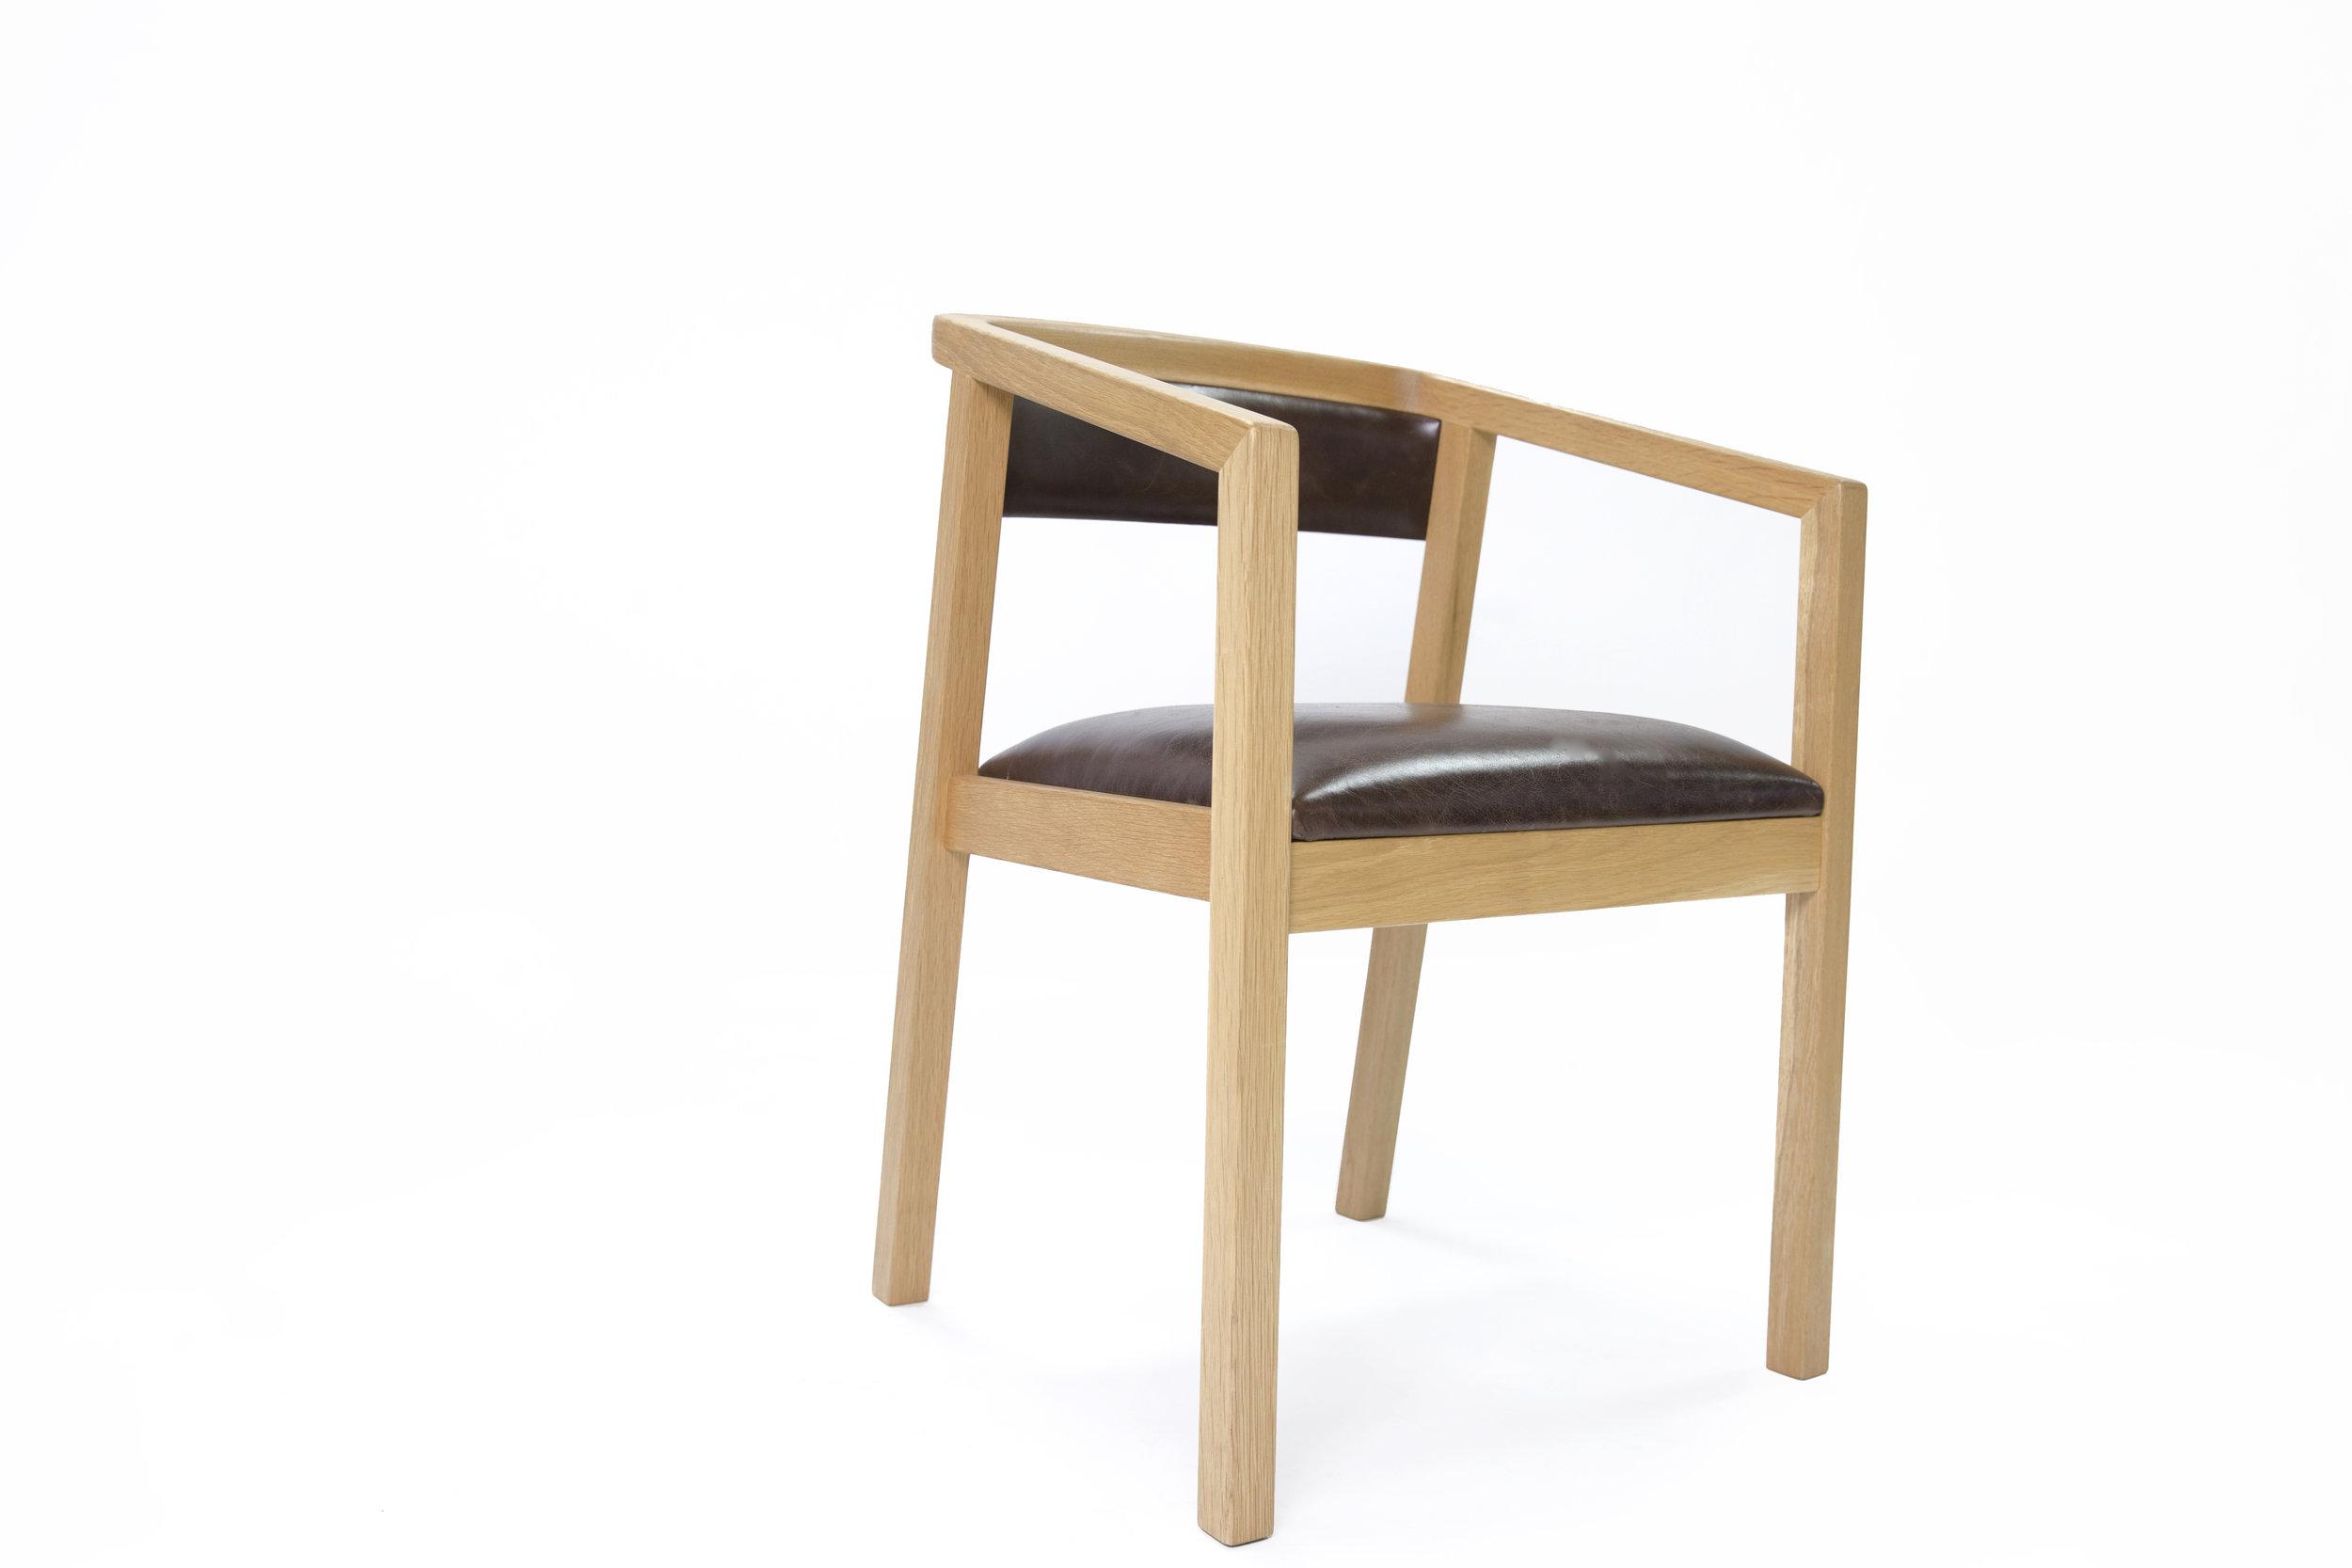 The Milford Chair